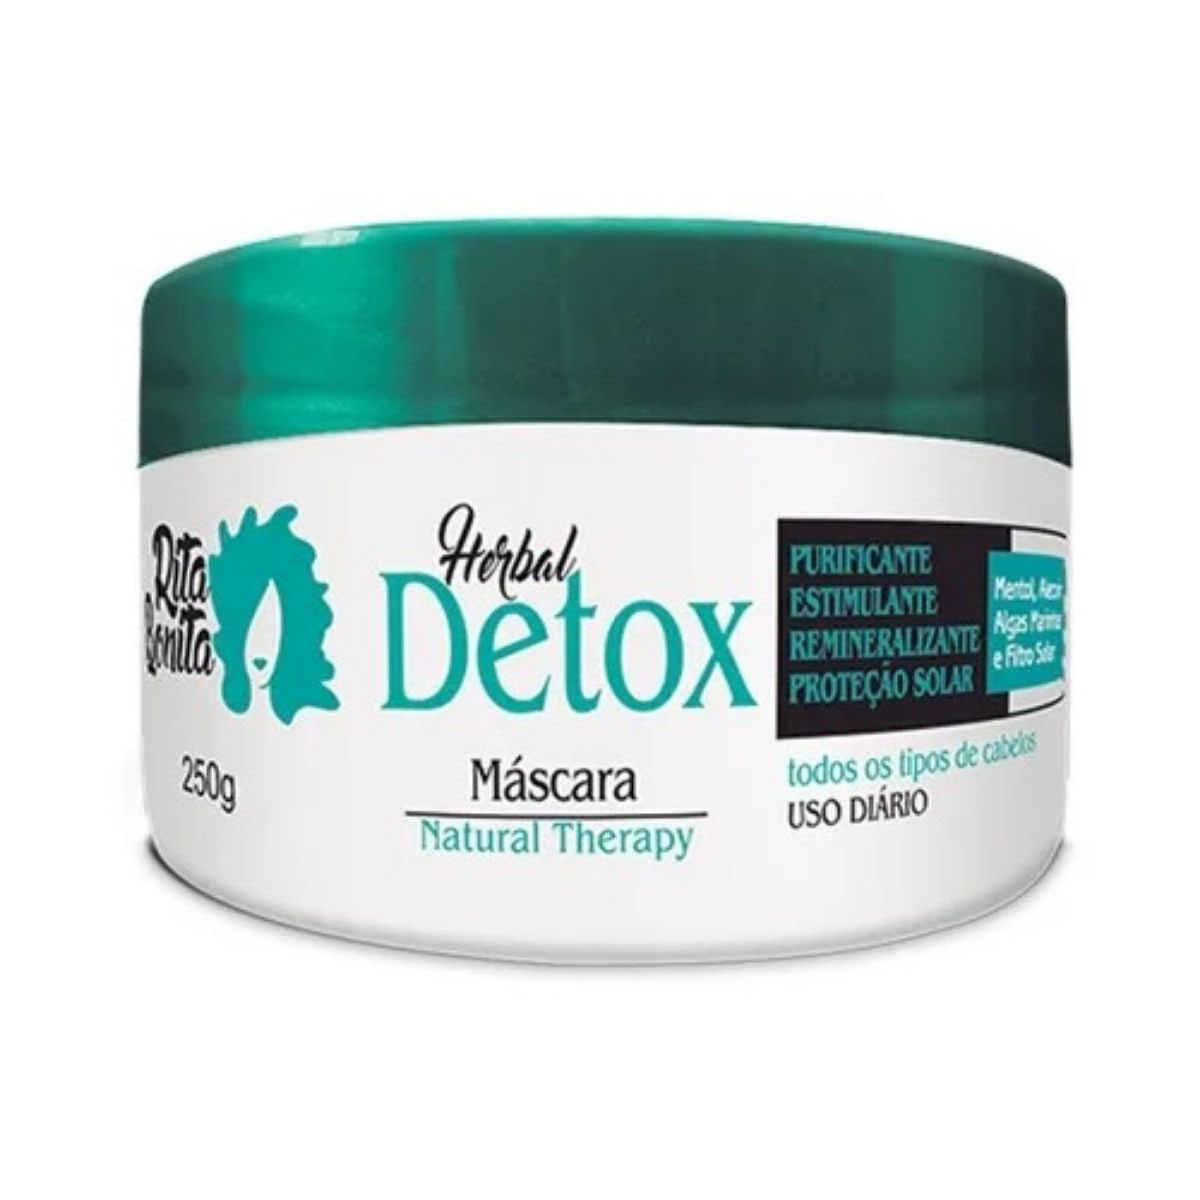 Herbal Detox - Máscara Rita Bonita 250g